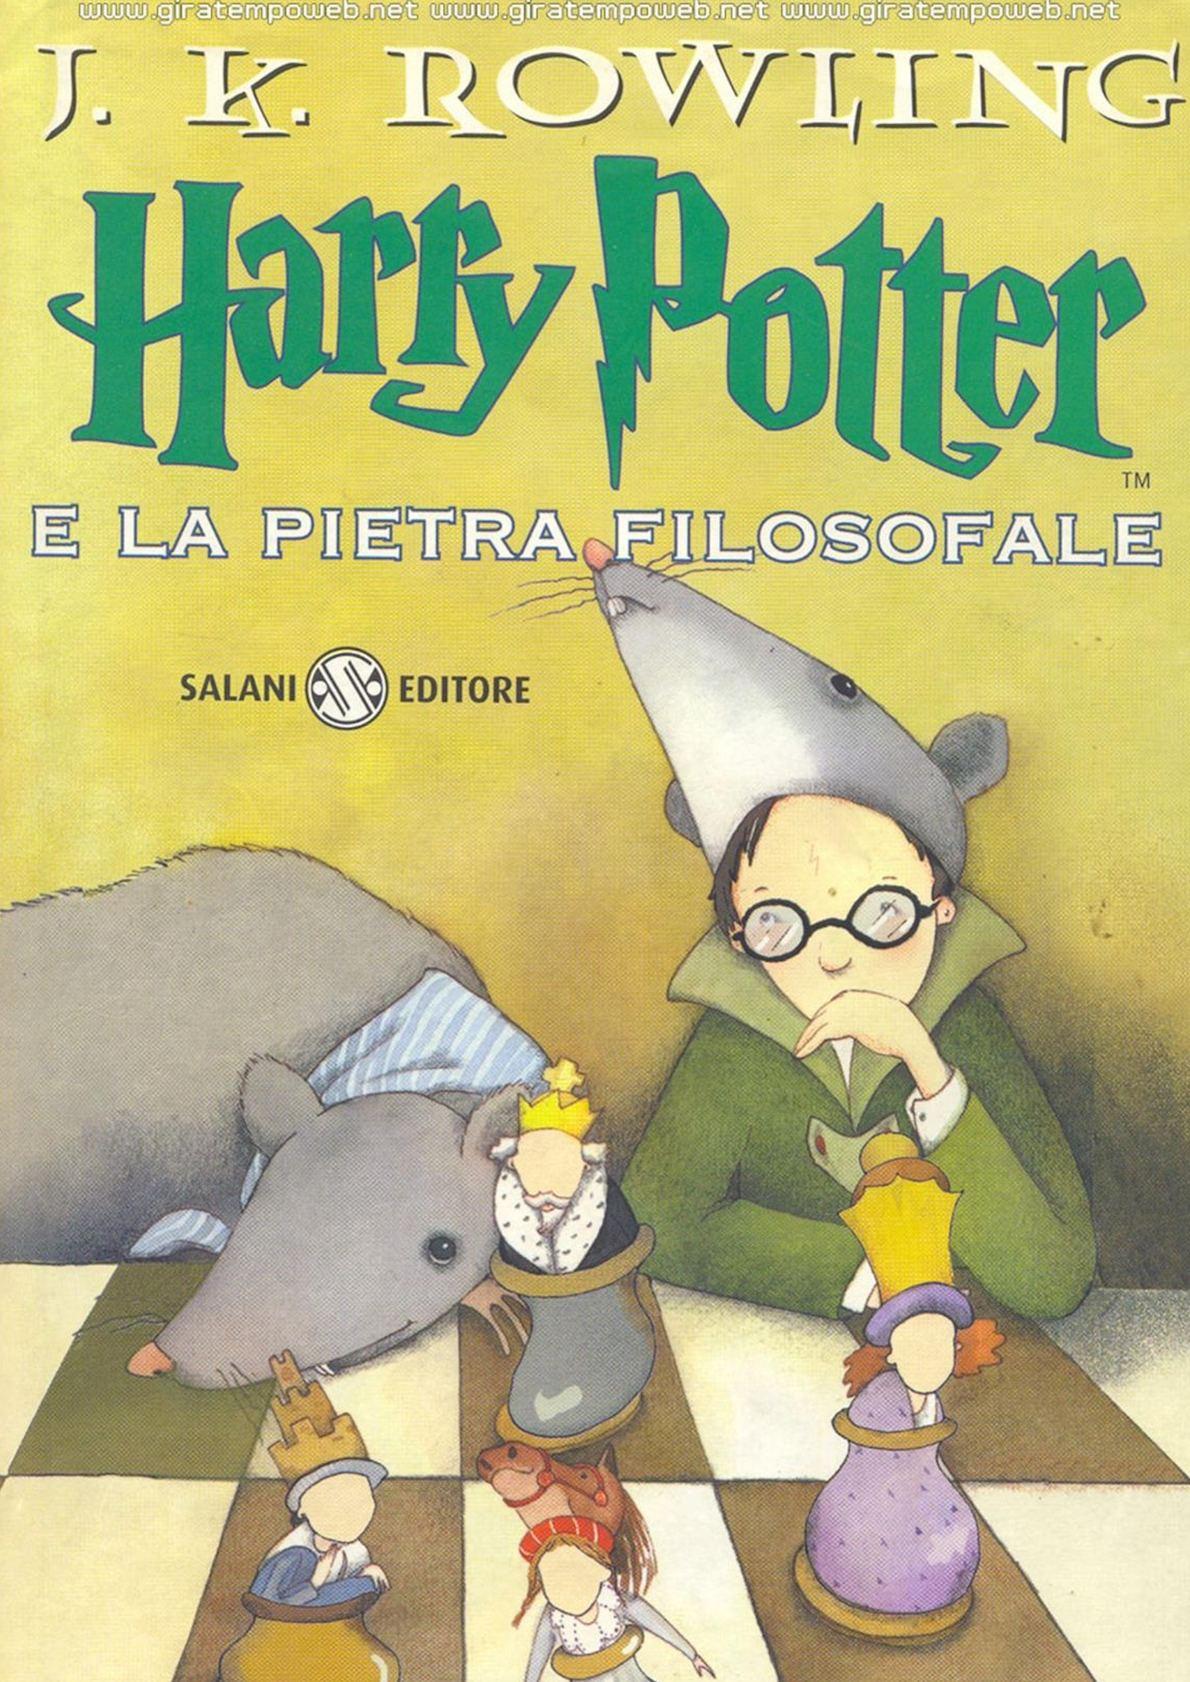 Harry Potter e la pietra filosofale (1997)